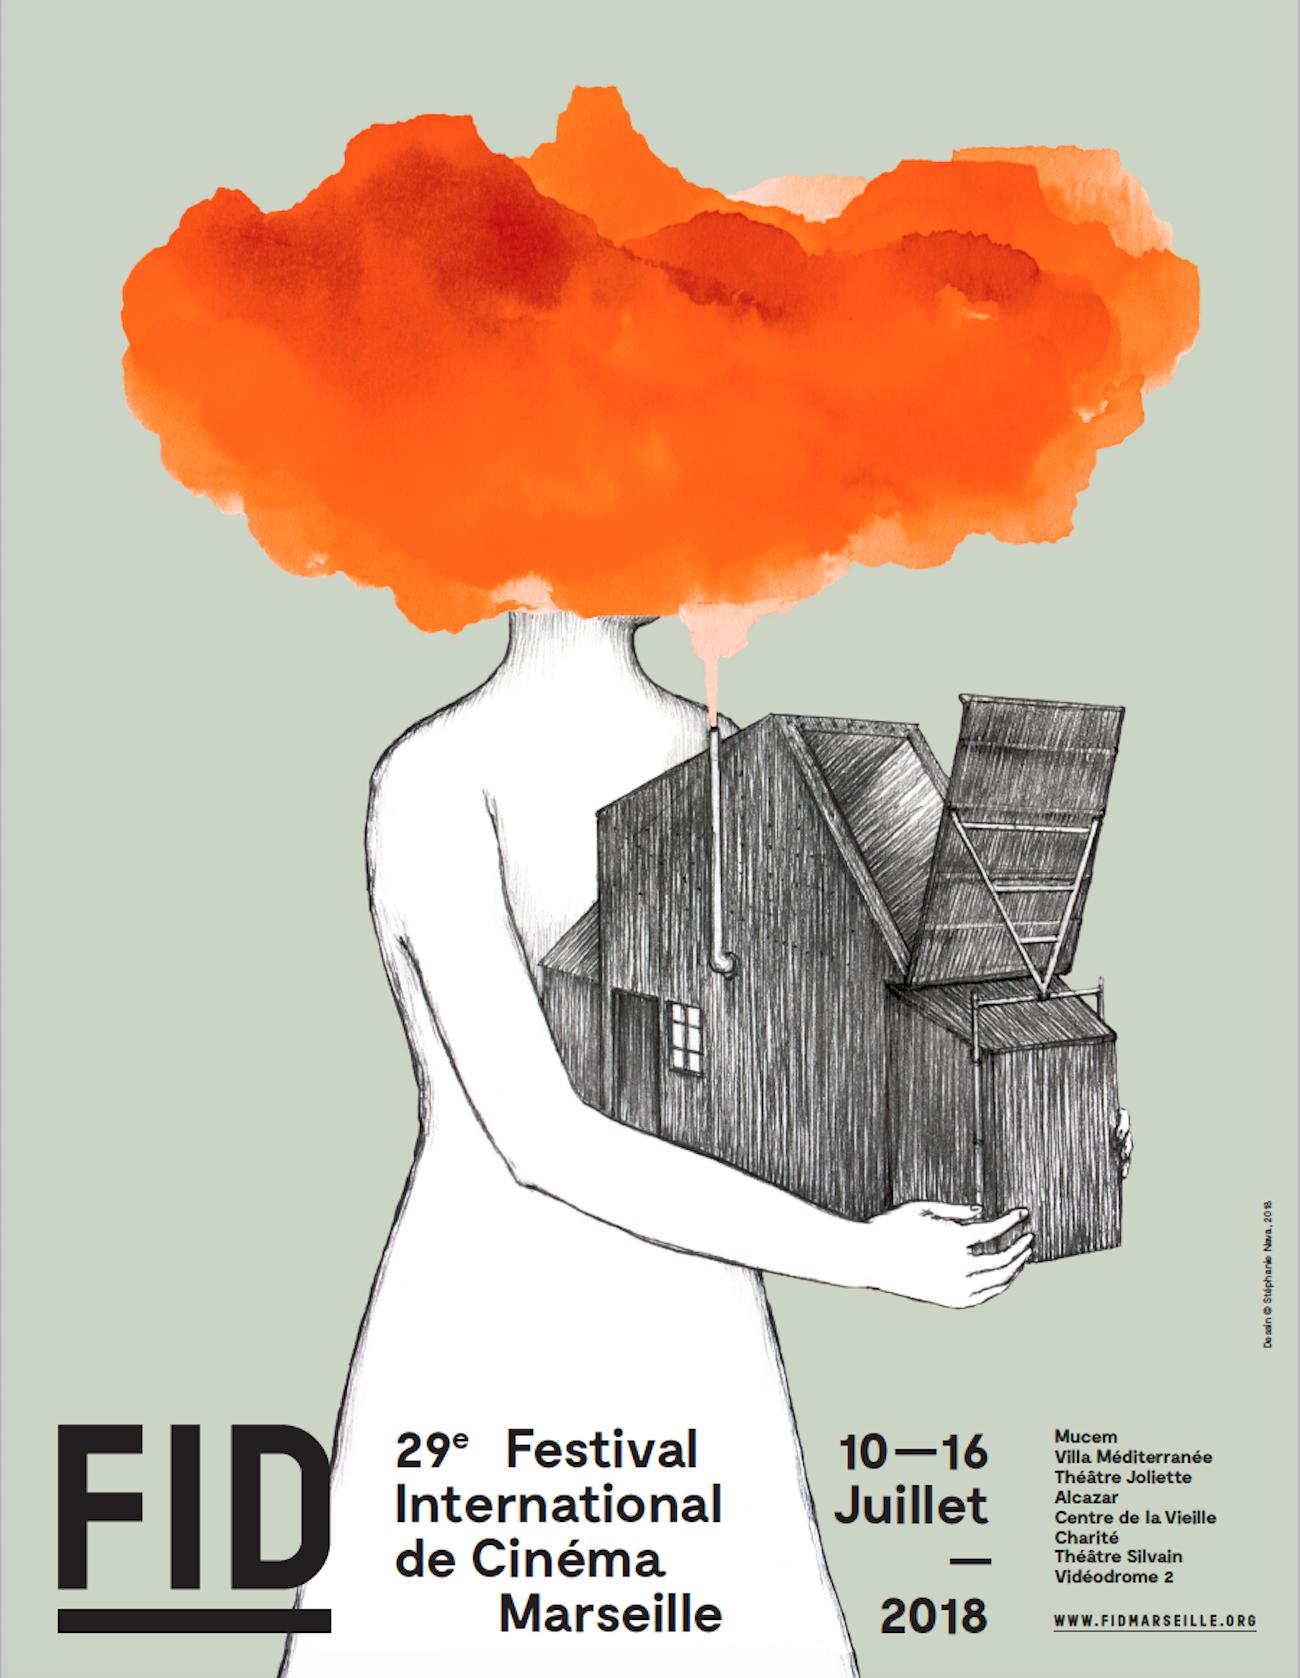 Affiche du FIDMarseille 2018